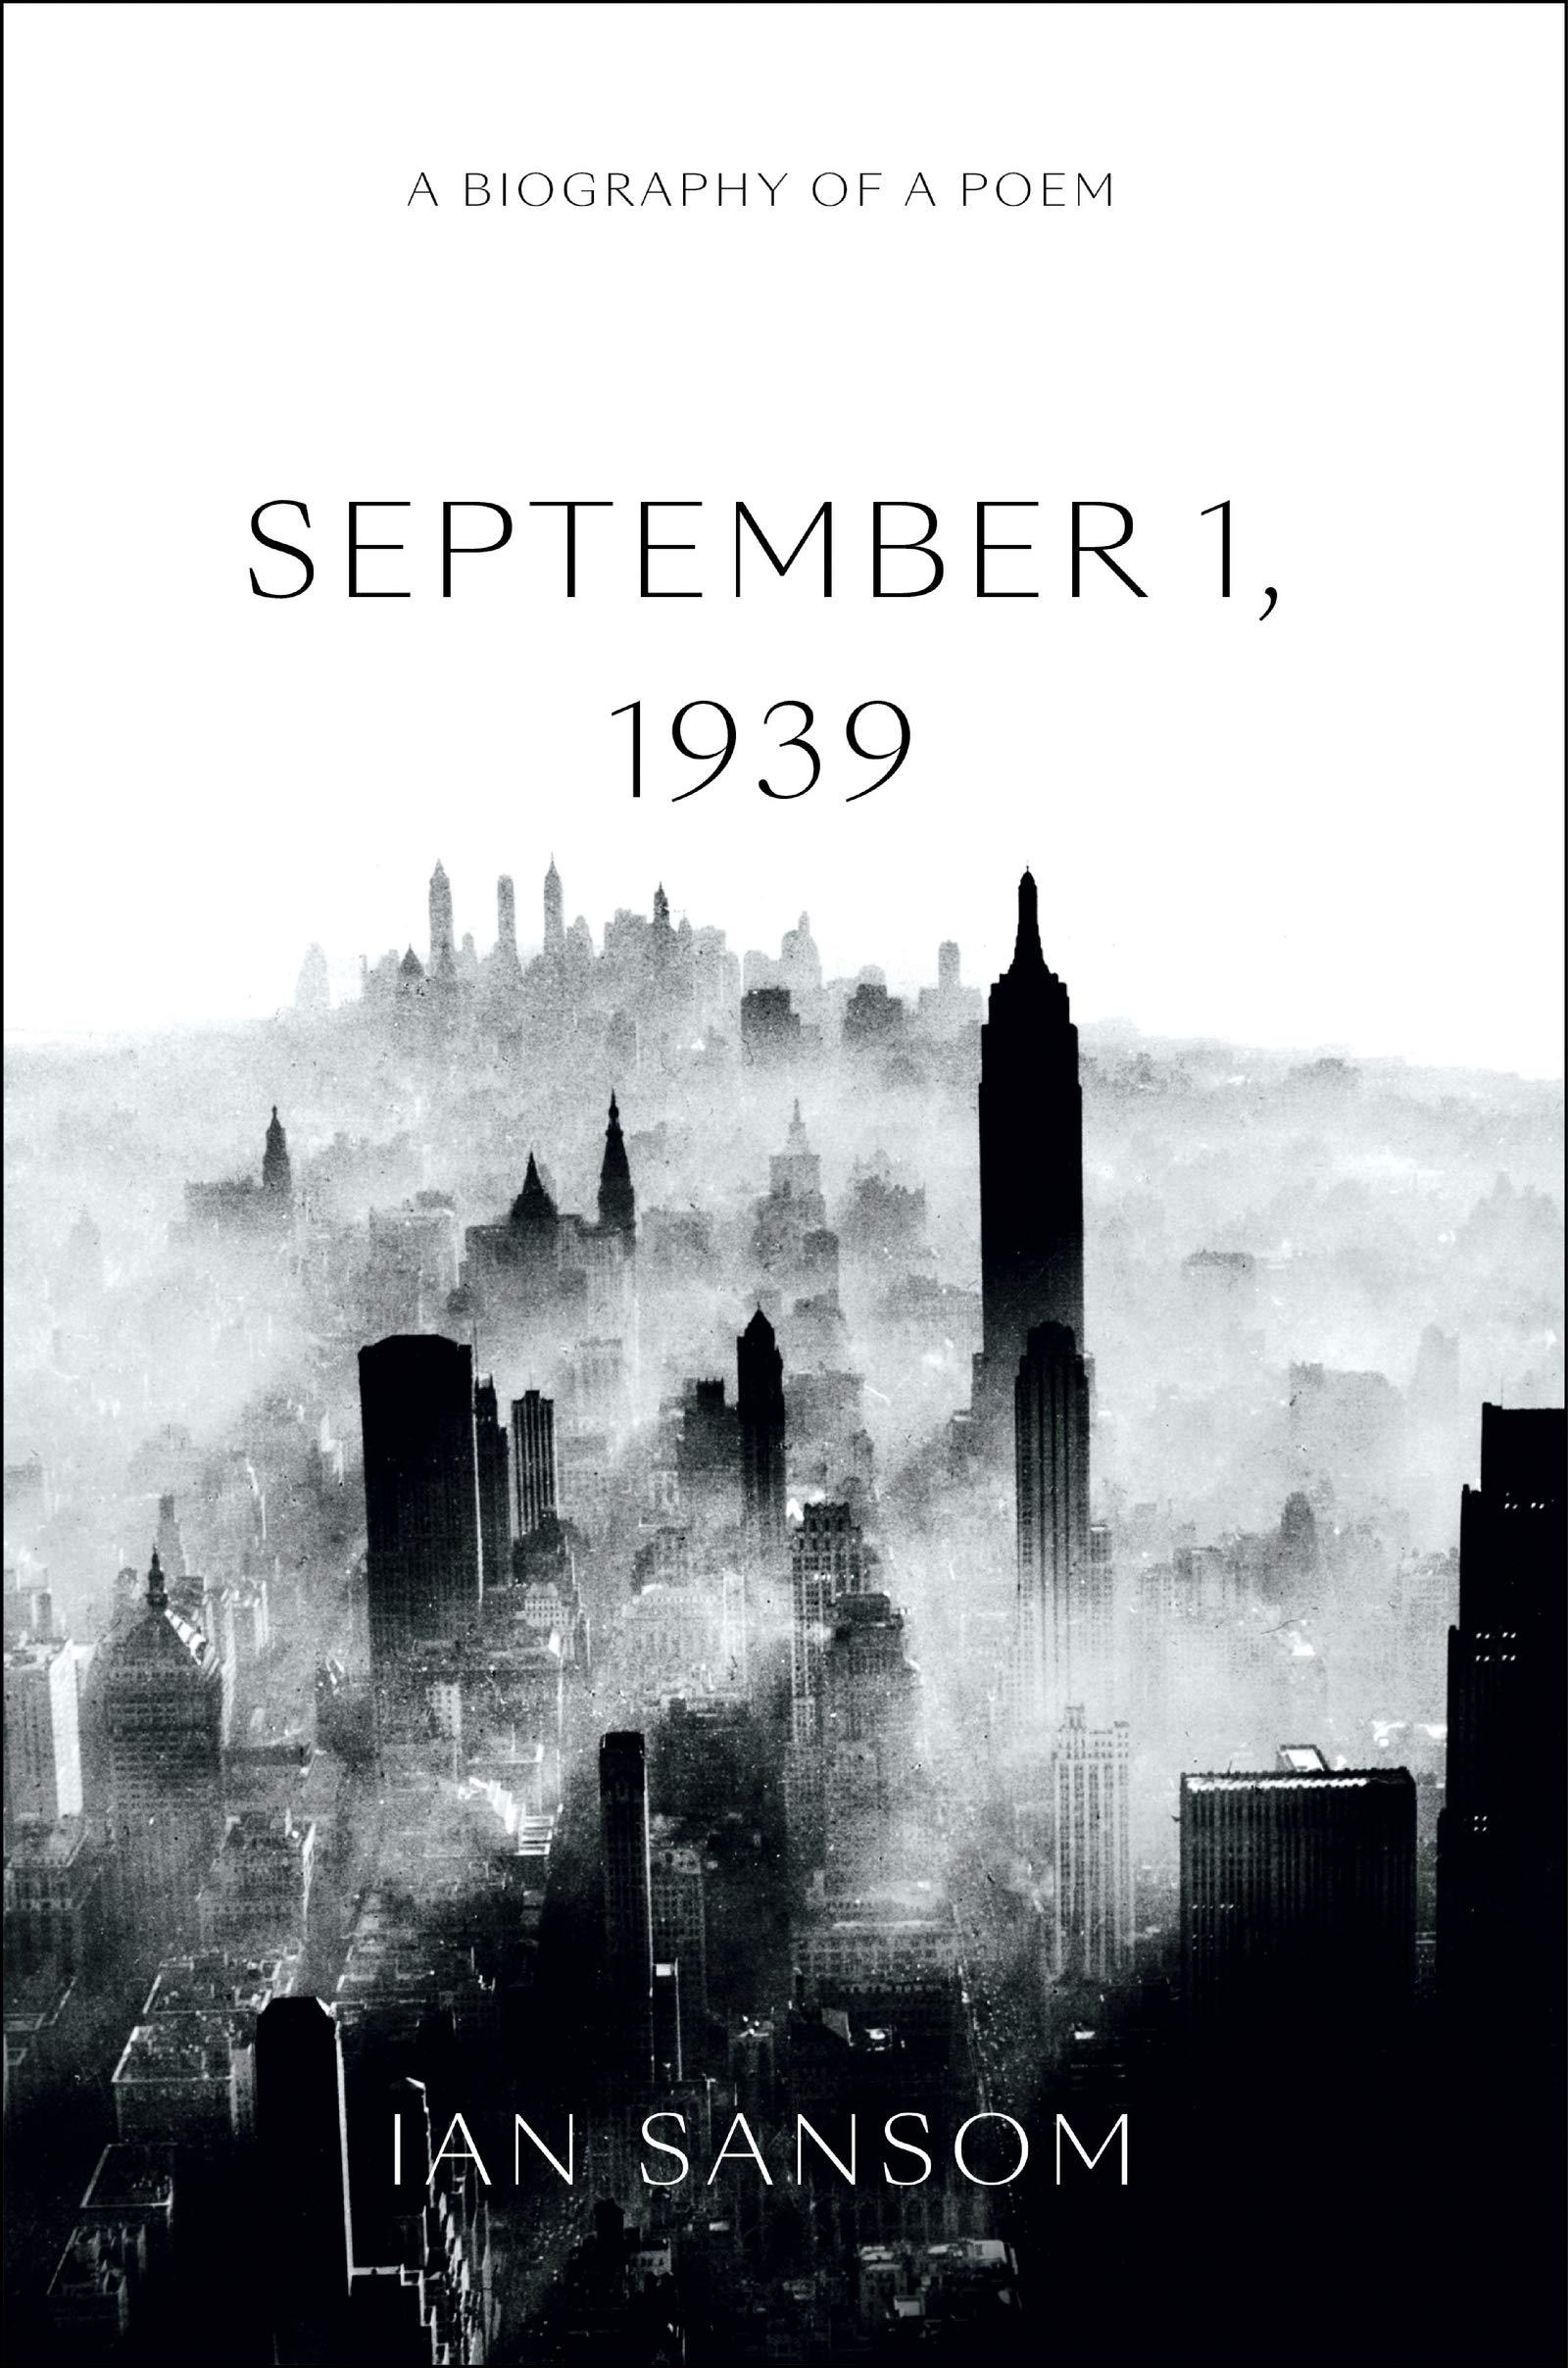 Amazoncom September 1 1939 A Biography Of A Poem